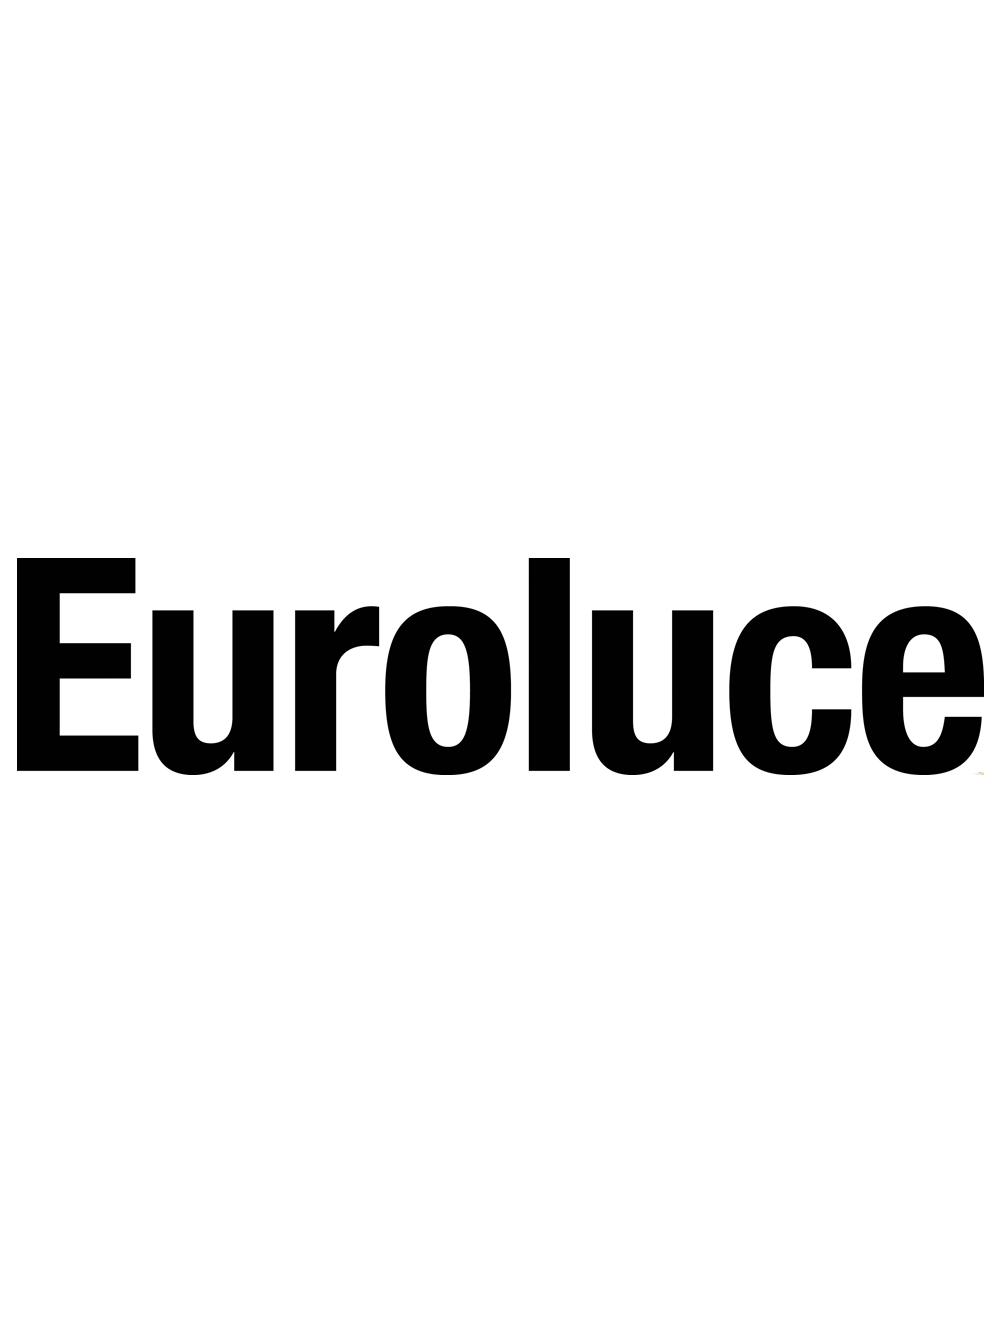 euroluce_1000x1333.png